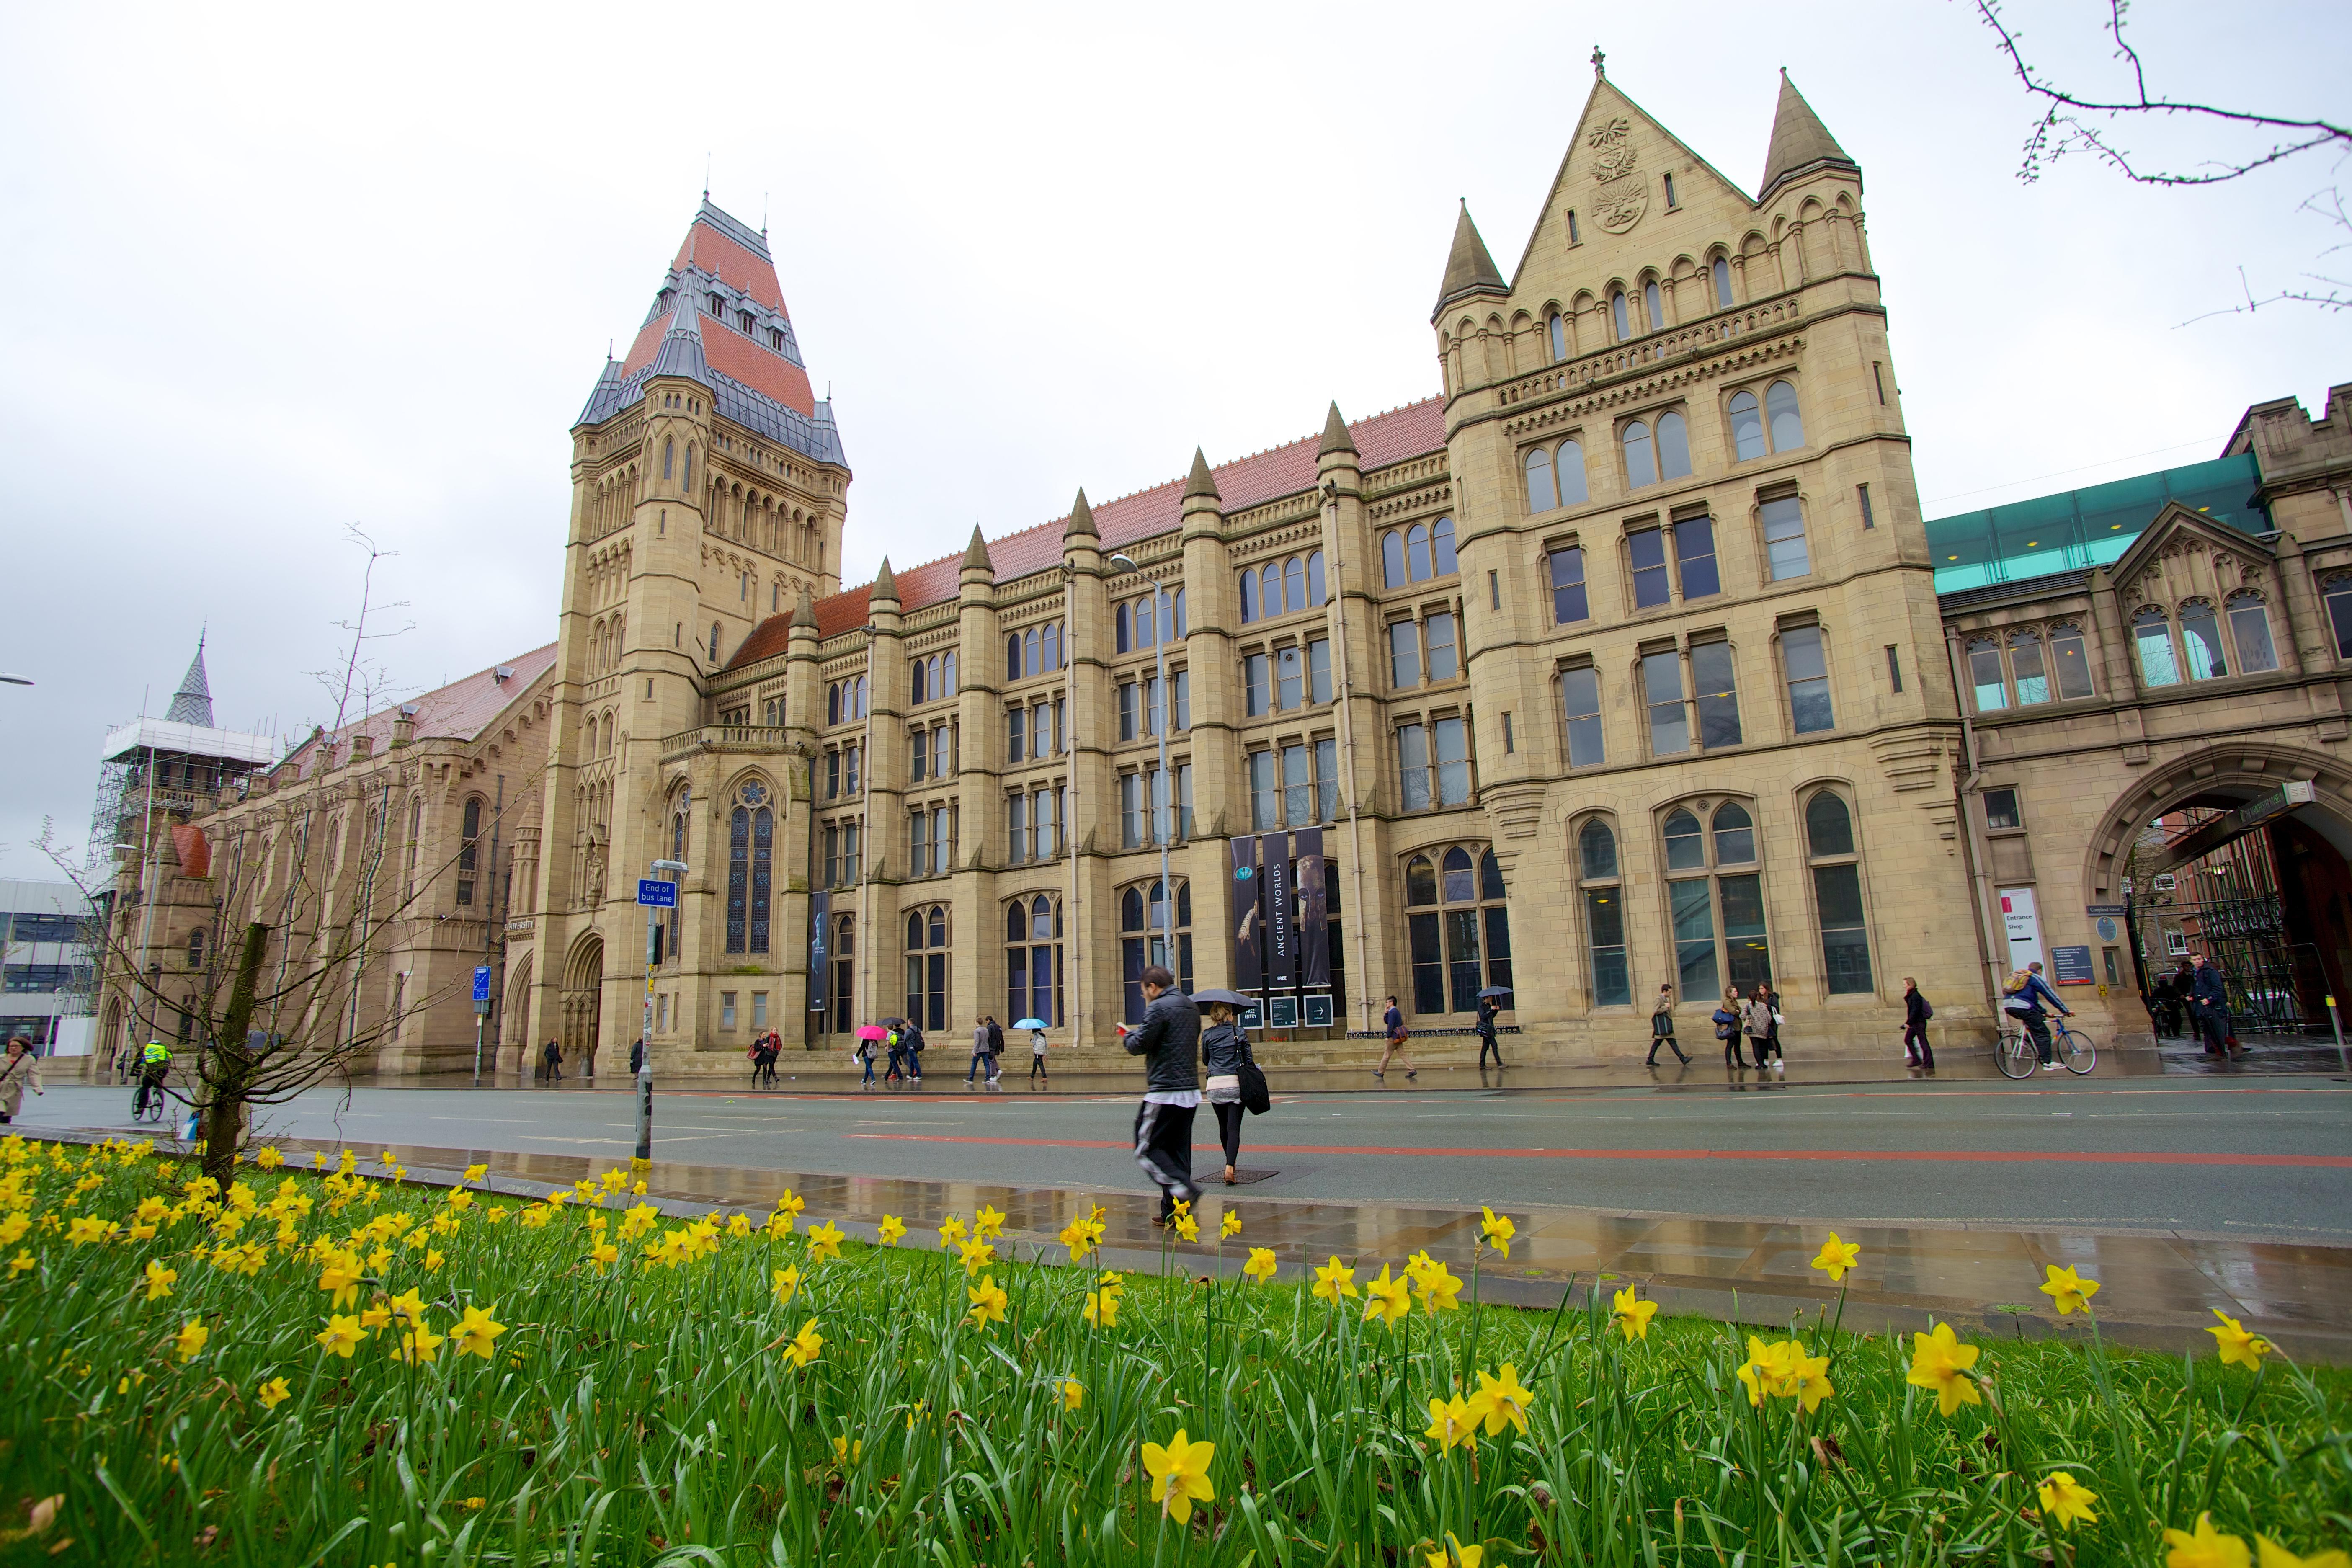 Imagebox_-_Manchester_Museum-125.jpg?1549532700